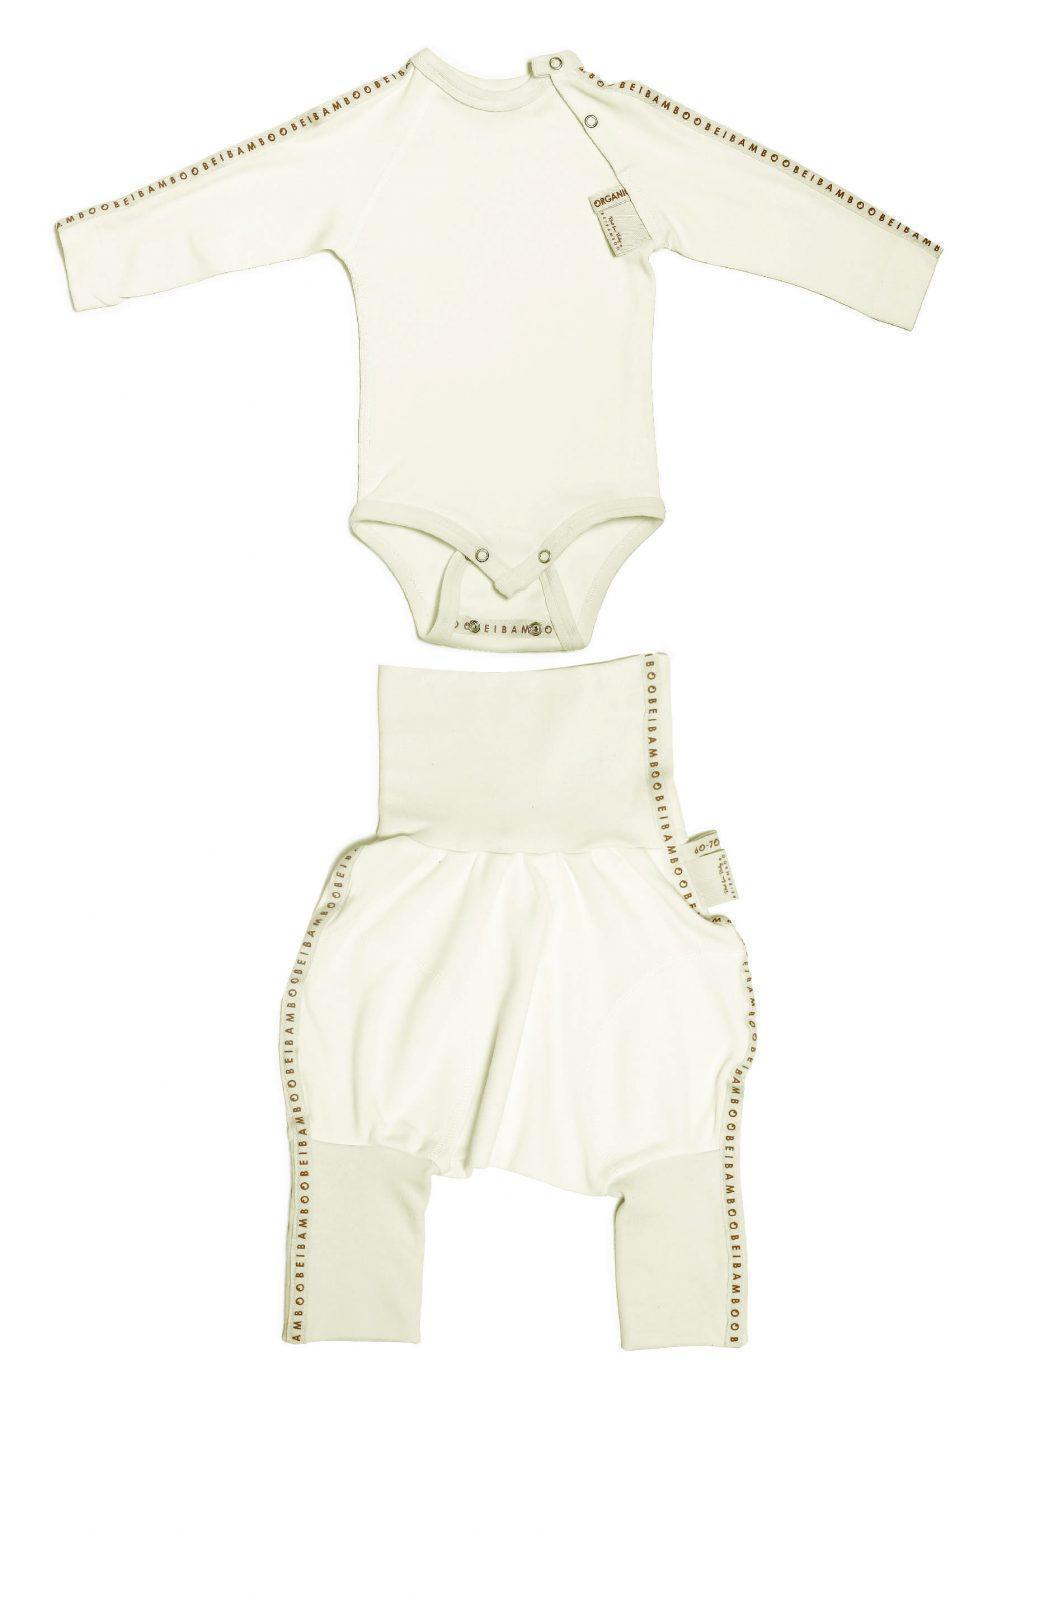 9c4b1192ba3 SET Baby Grow(Overhead) Trousers - Baby Clothing - B E I B A M B O O